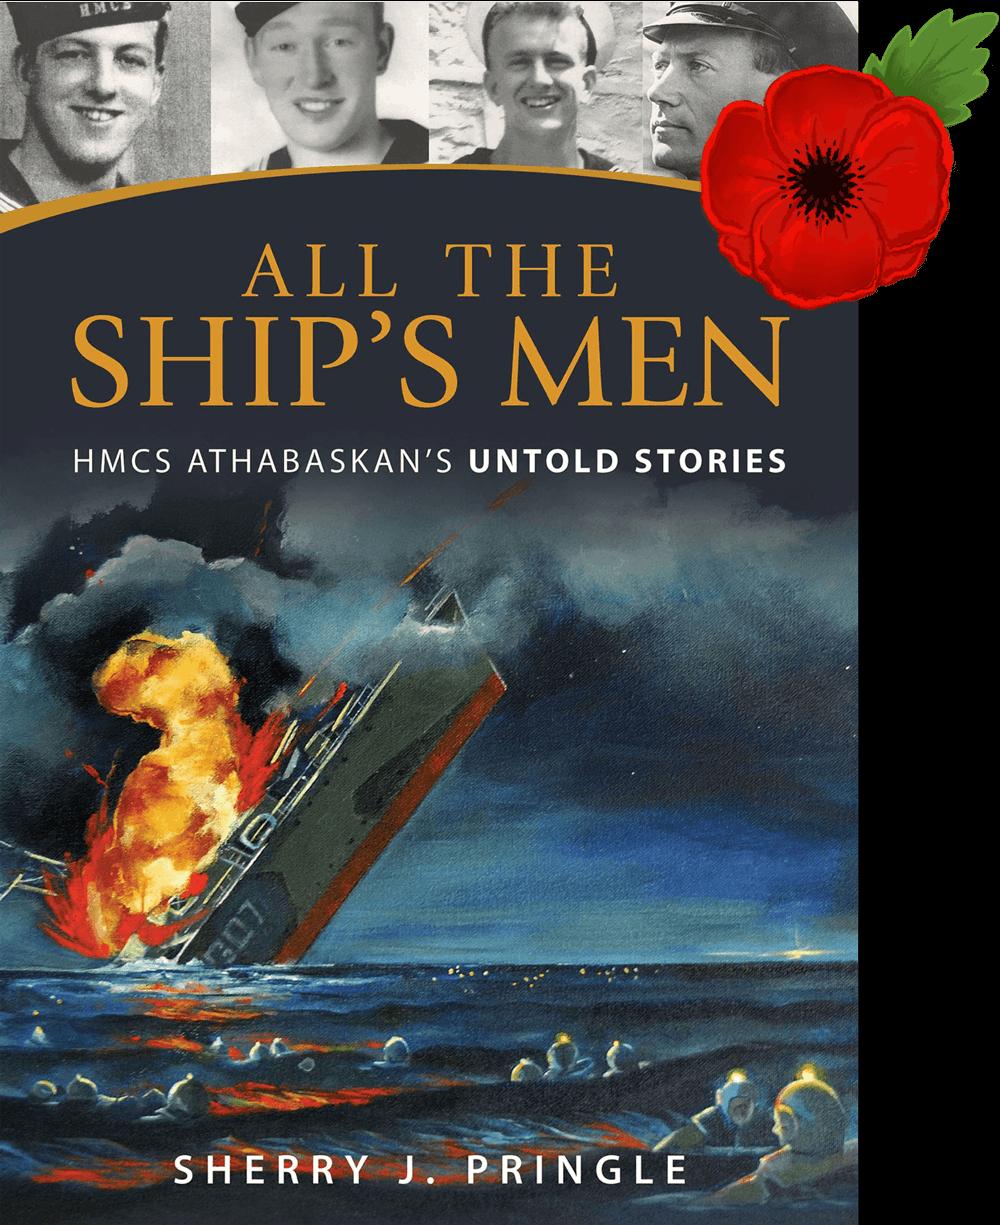 All The Ship's Men book cover